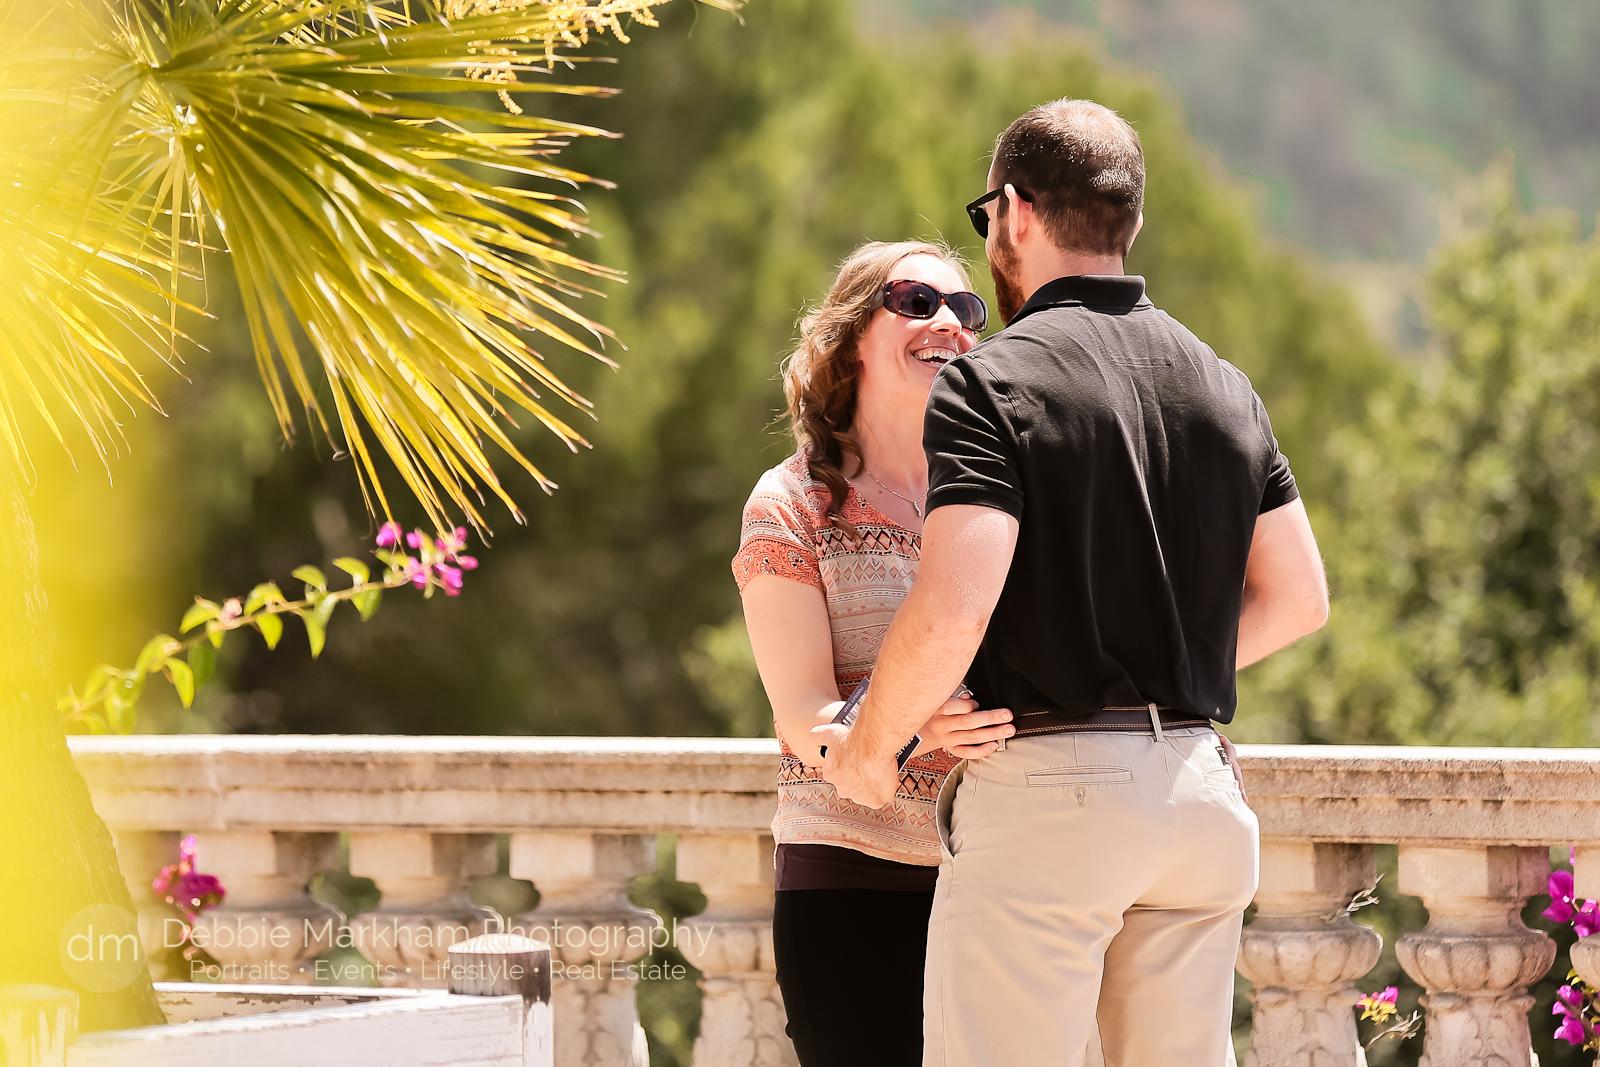 Surprise Proposal at Hearst Castle by Debbie Markham